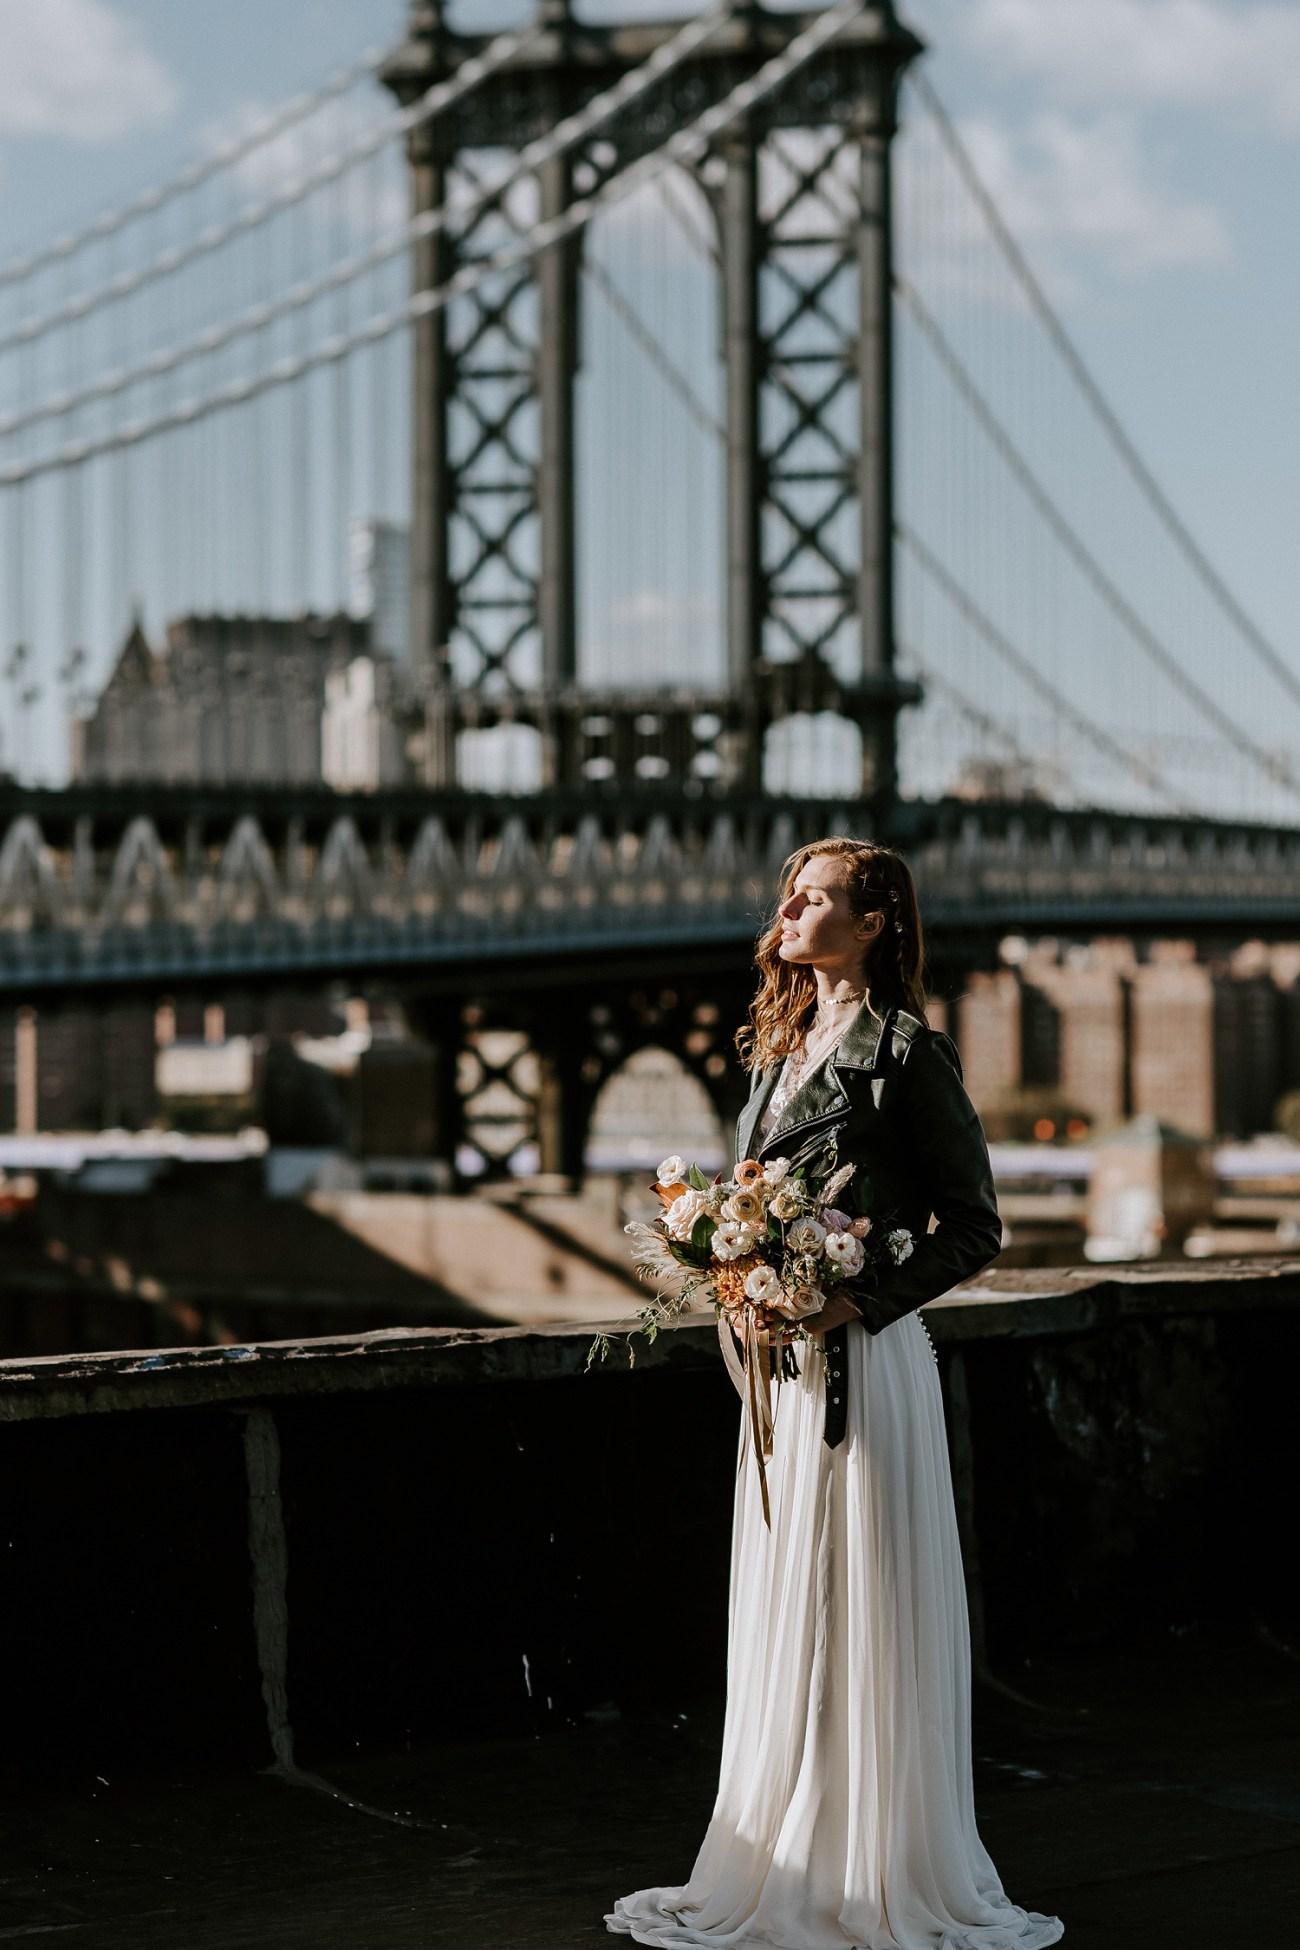 Wedding dress inspiration. Flowy wedding gown inspiration. Boho wedding dress. Brooklyn rooftop elopement. Brooklyn rooftop wedding. Brooklyn wedding photographer. New York City wedding photographer. New York elopement photographer. Anais Possamai Photography